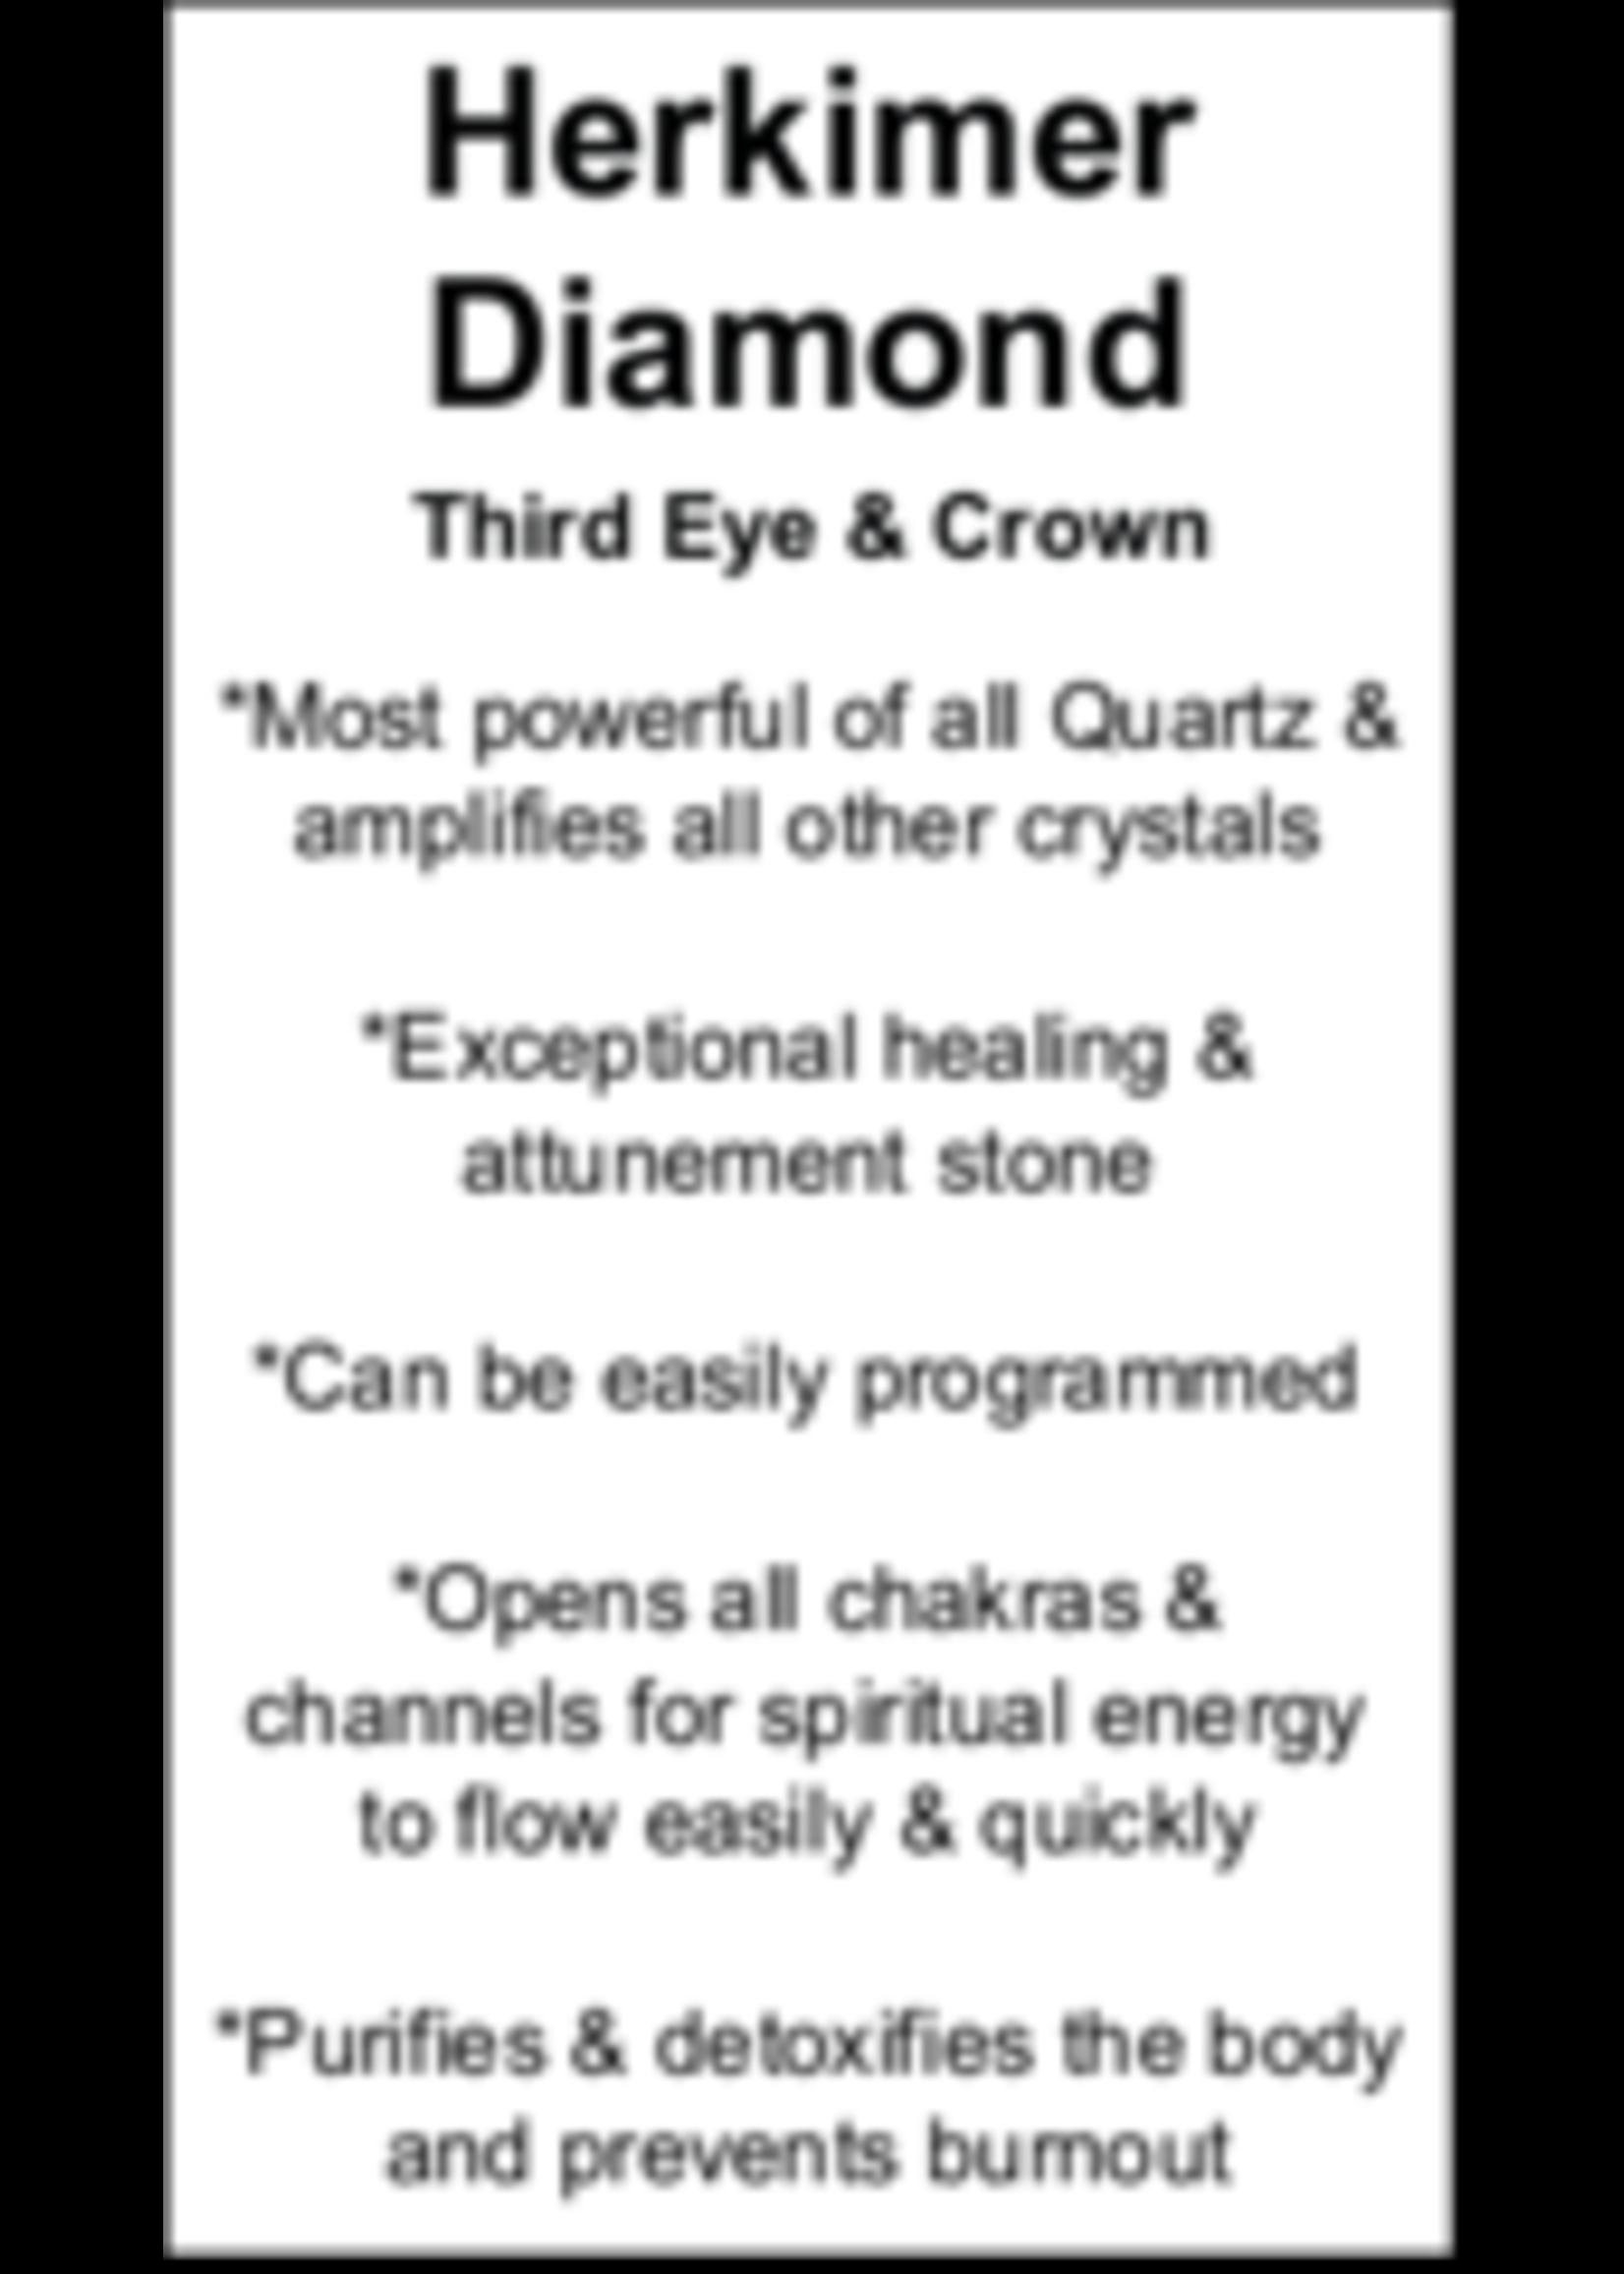 Herkimer Diamond Cards - Box of 250